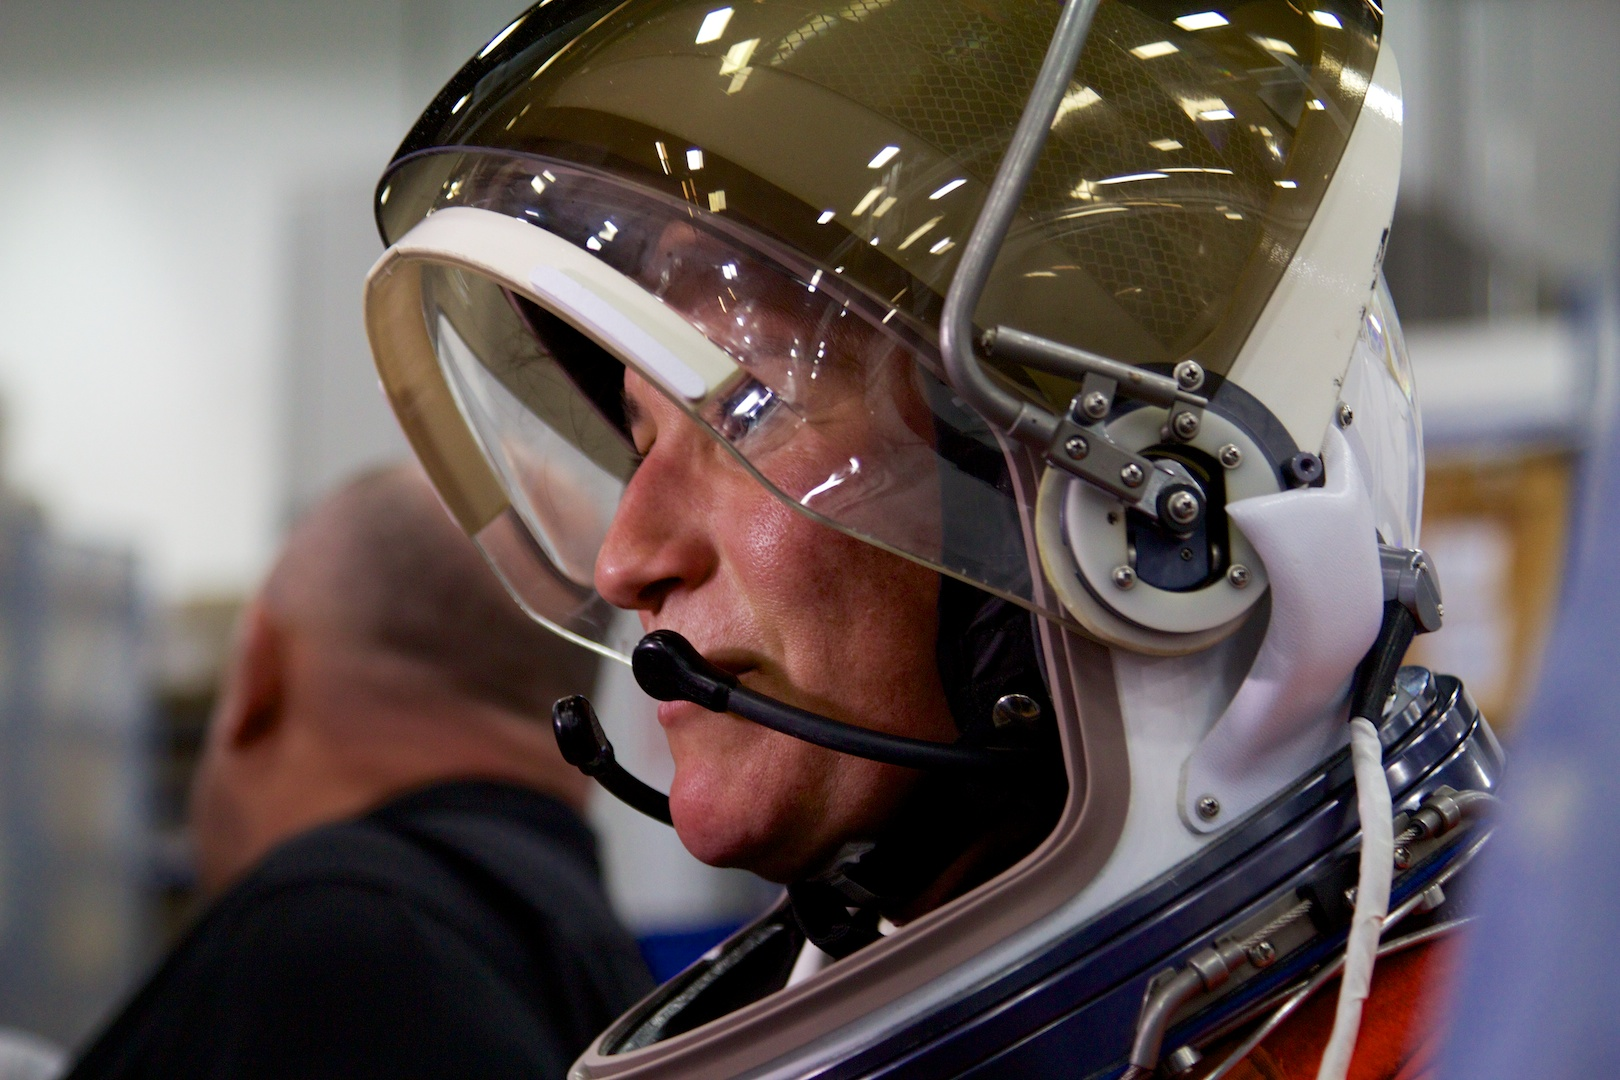 astronaut on spaceship - photo #33